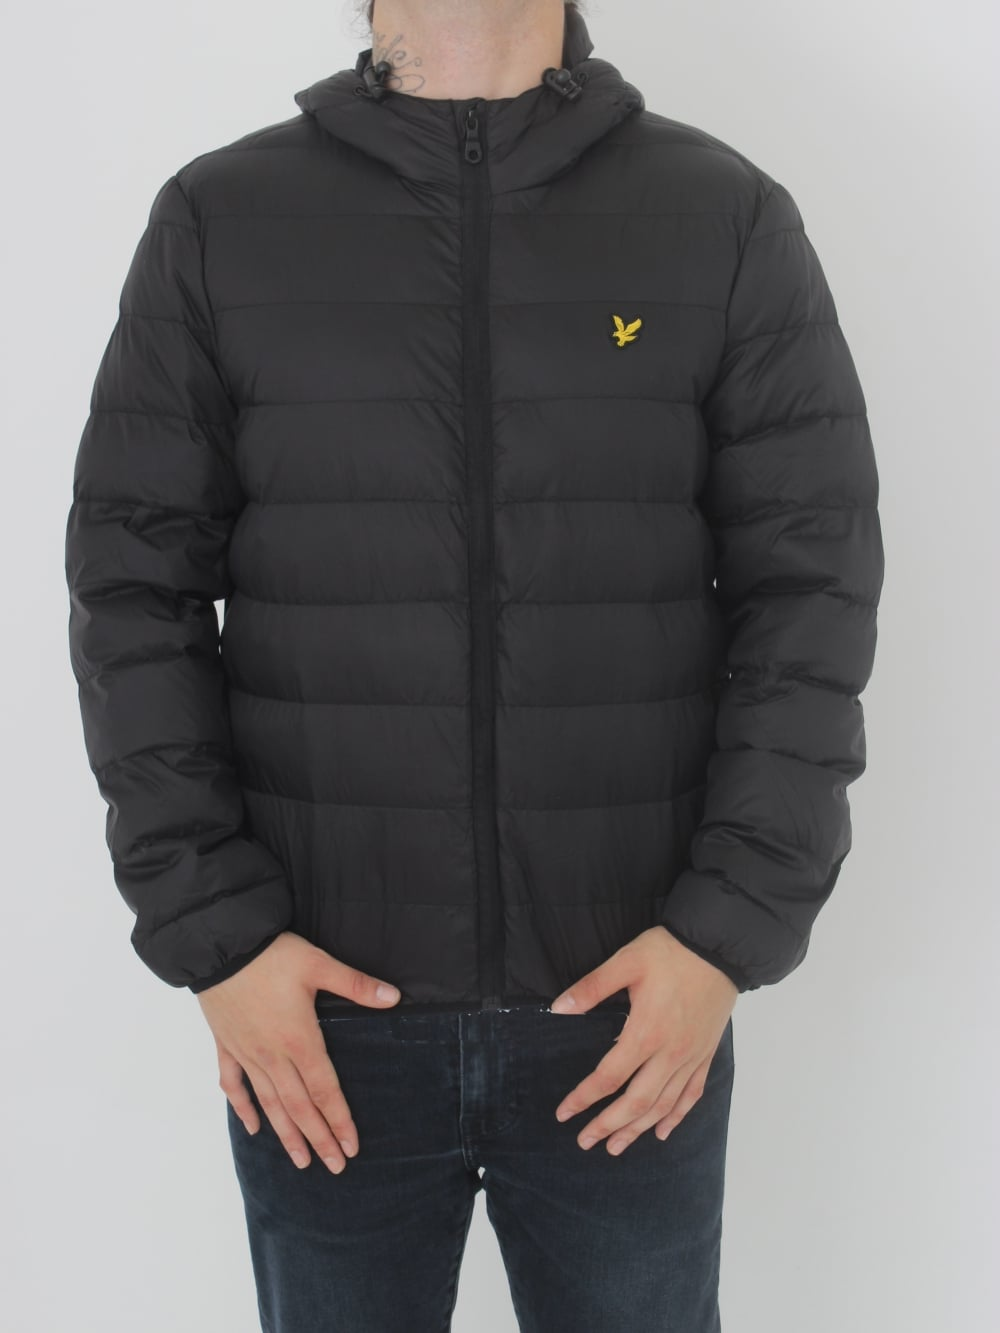 Lyle   Scott Lightweight Puffer Jacket in Black - Northern Threads bee671a55